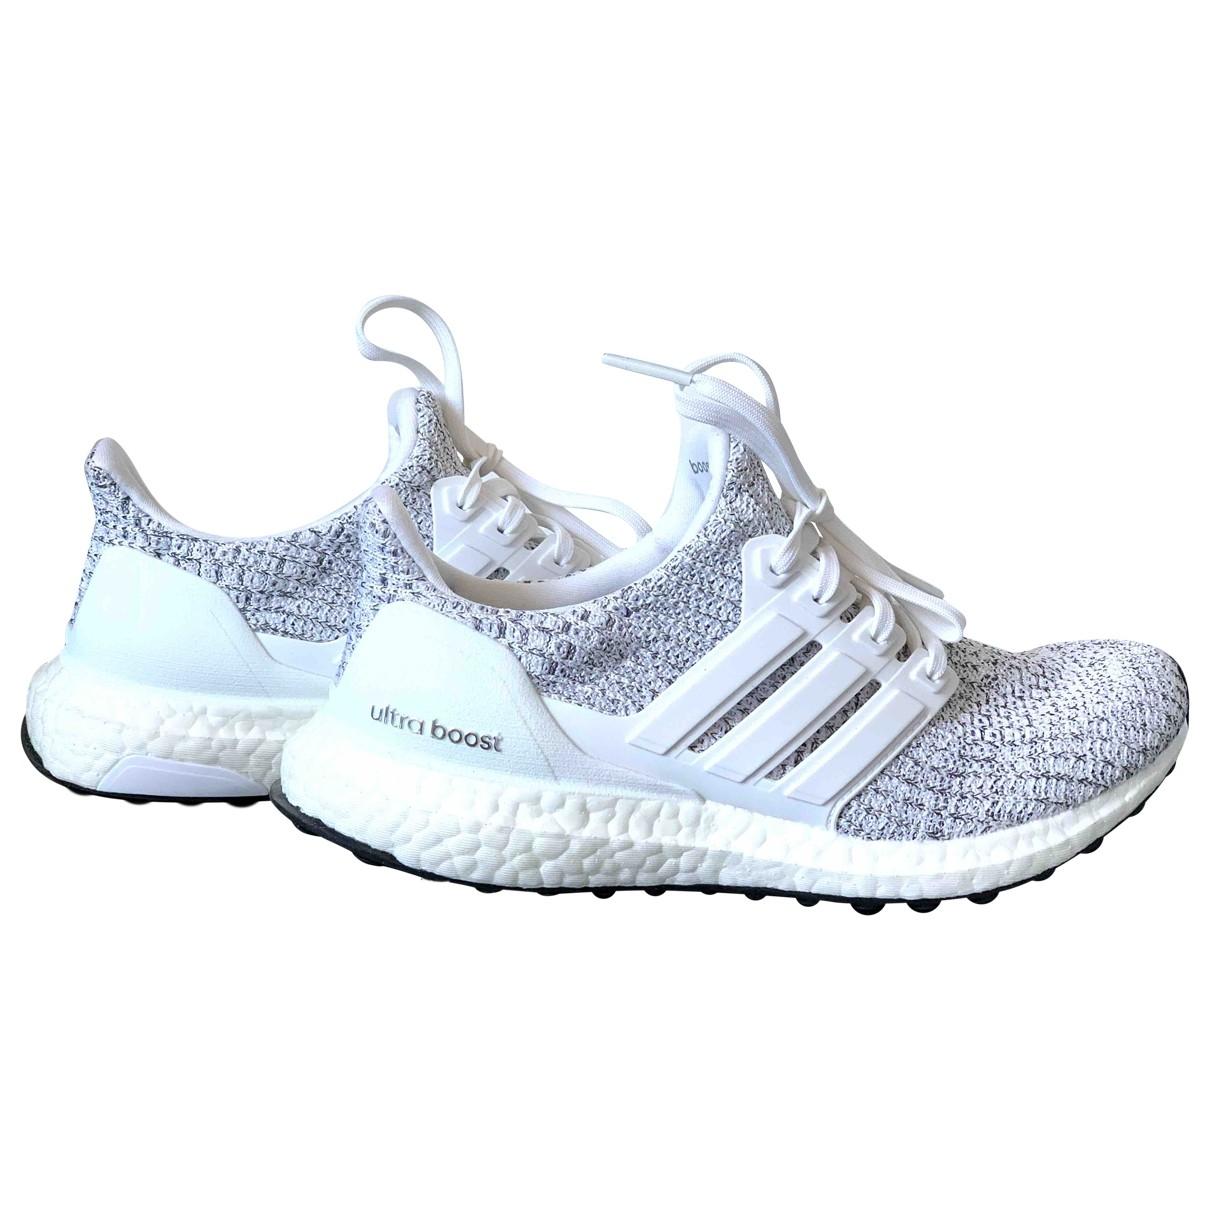 Adidas - Baskets Ultraboost pour femme - blanc